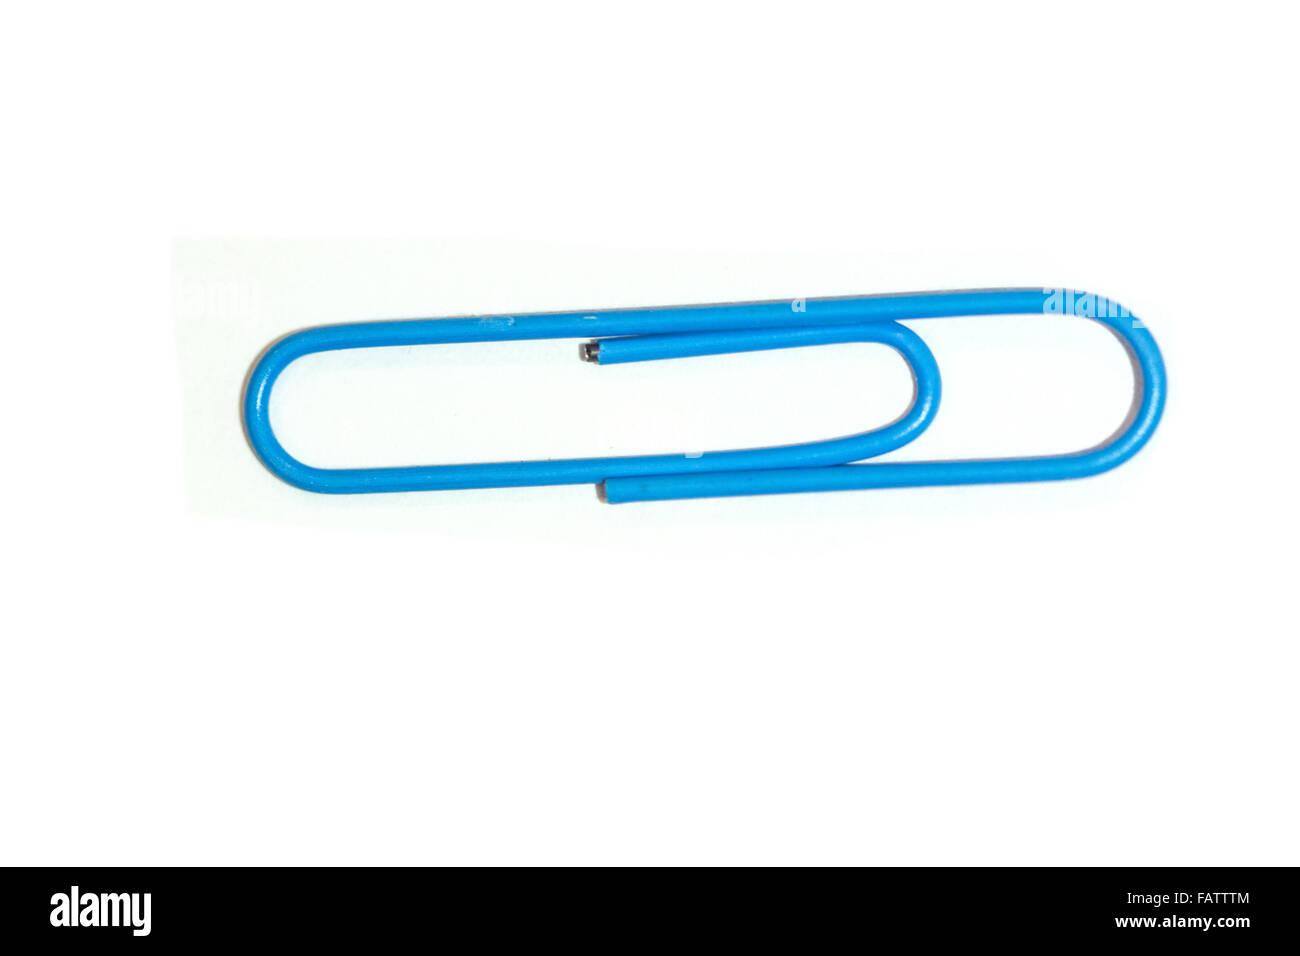 A blue paper clip - Stock Image